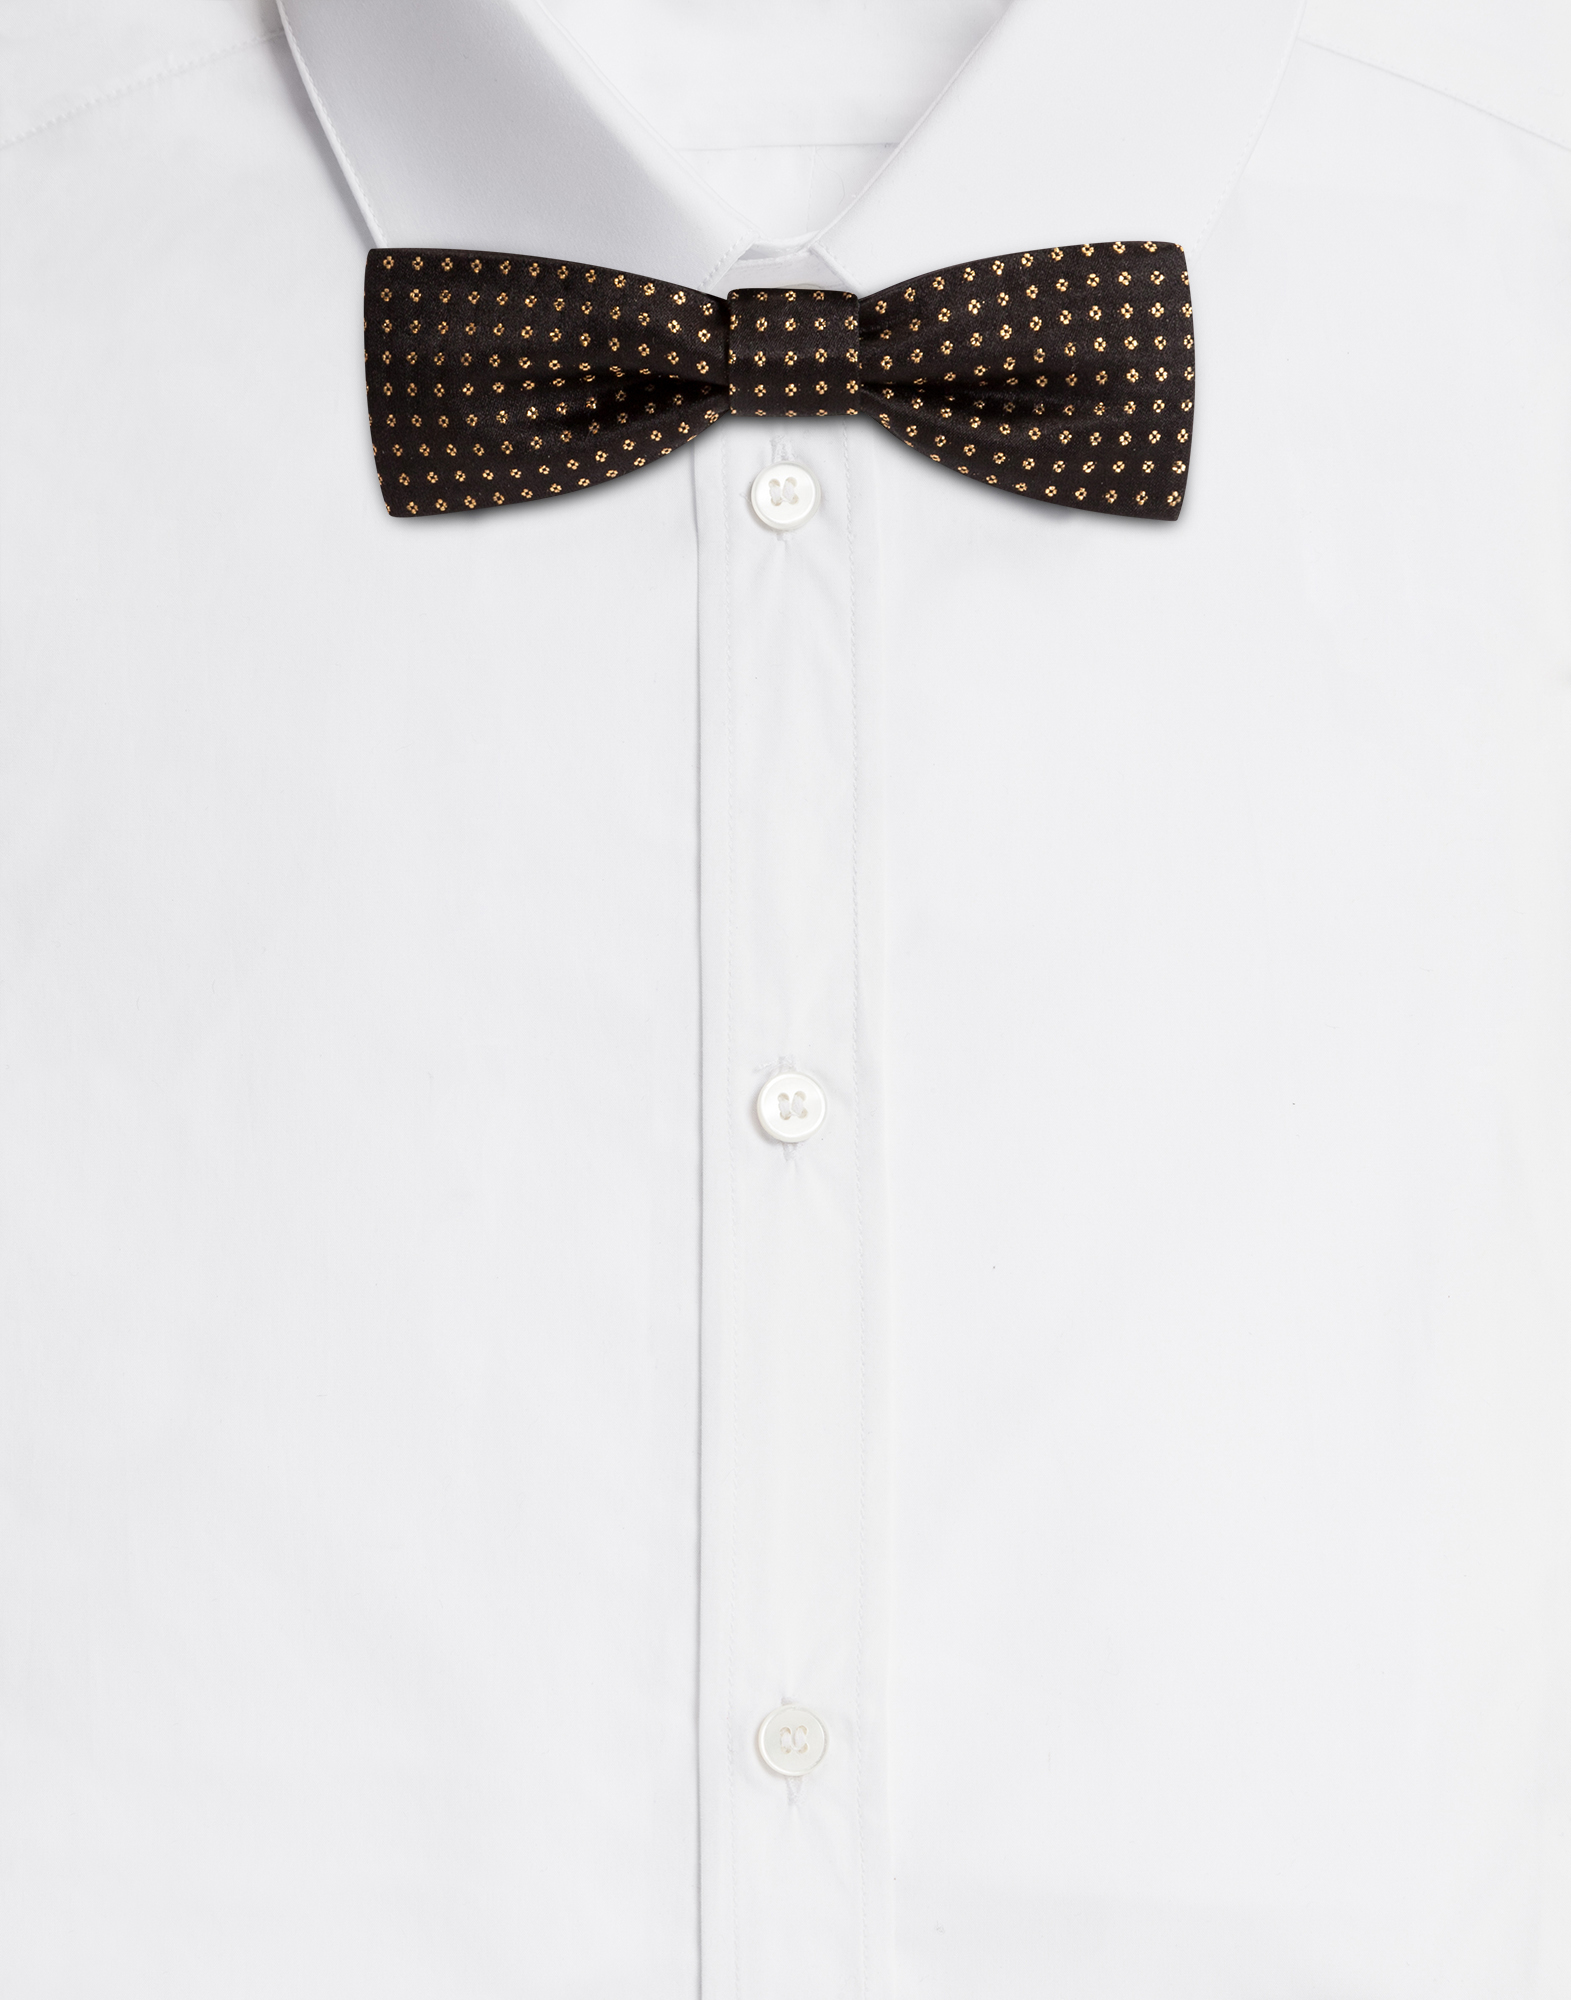 Dolce & Gabbana BOW-TIE IN JACQUARD SILK